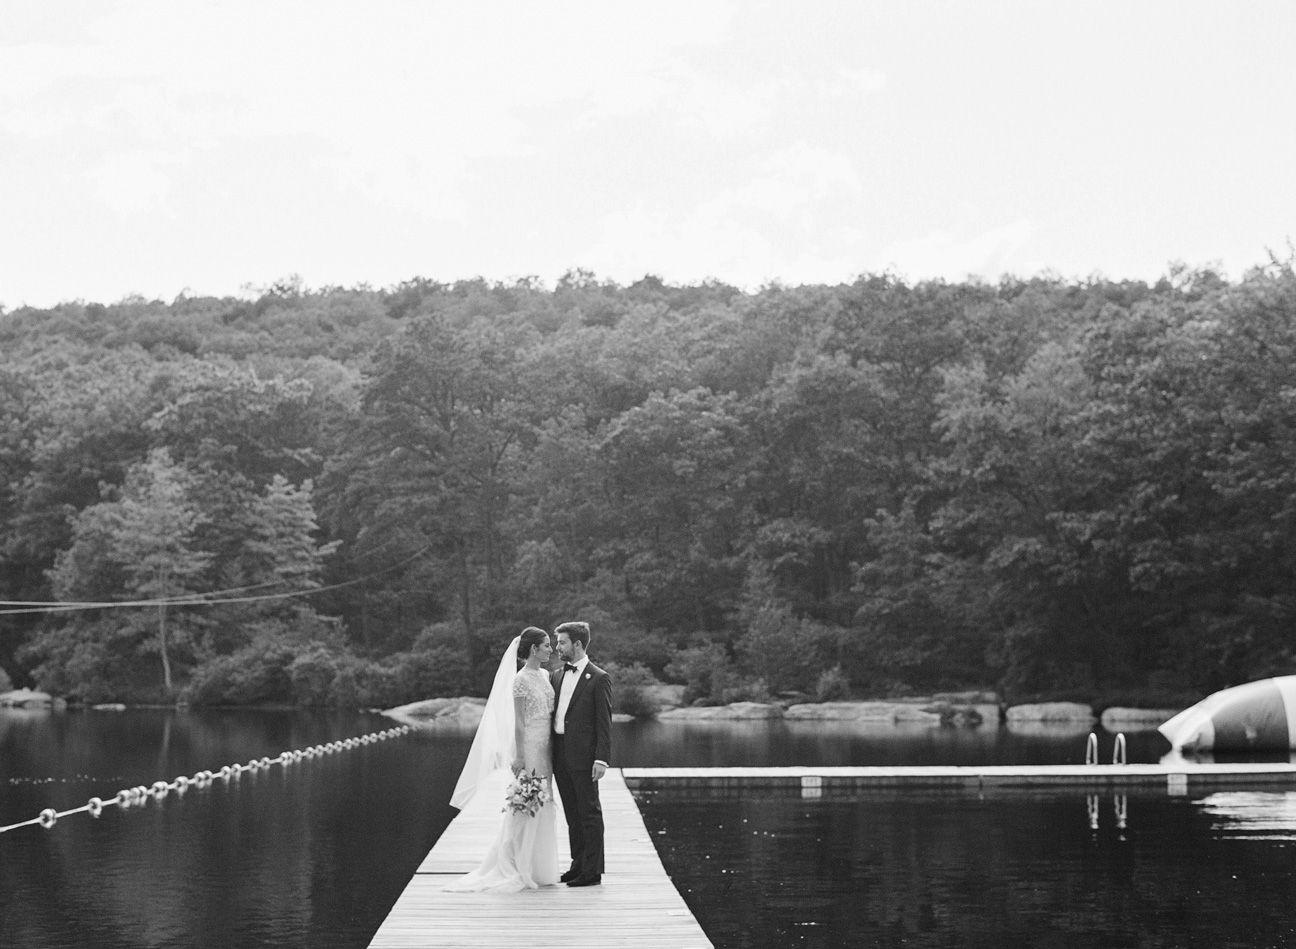 KarenHillPhotography-Parizat-Wedding-0322.jpg